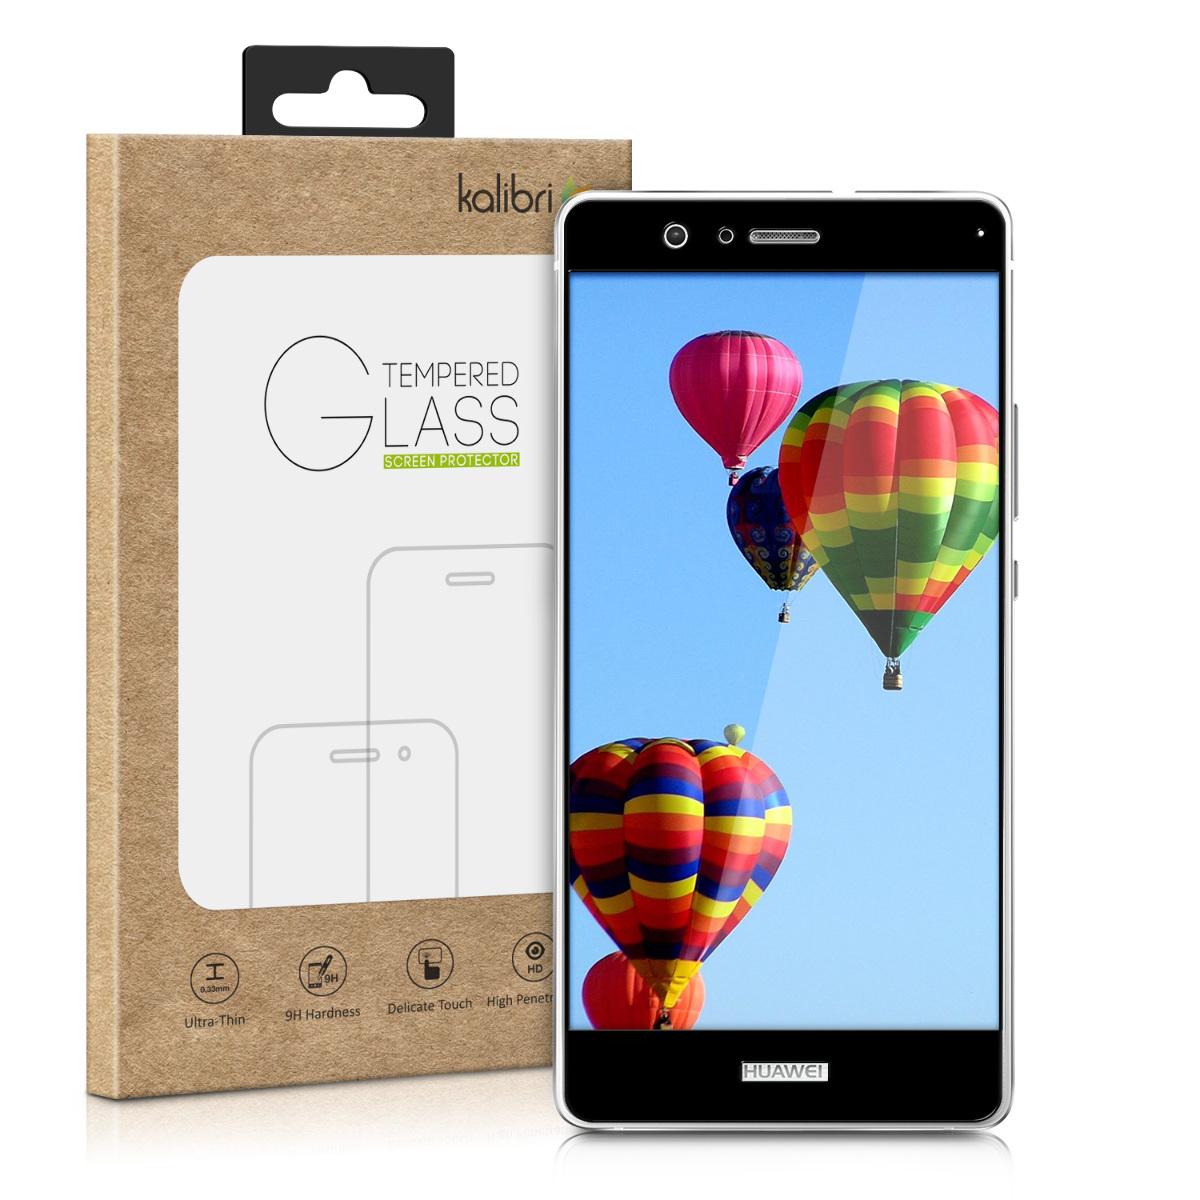 Kalibri Tempered Glass - Fullface Αντιχαρακτικό Γυαλί Οθόνης Huawei P9 Lite - Black (48799.01)